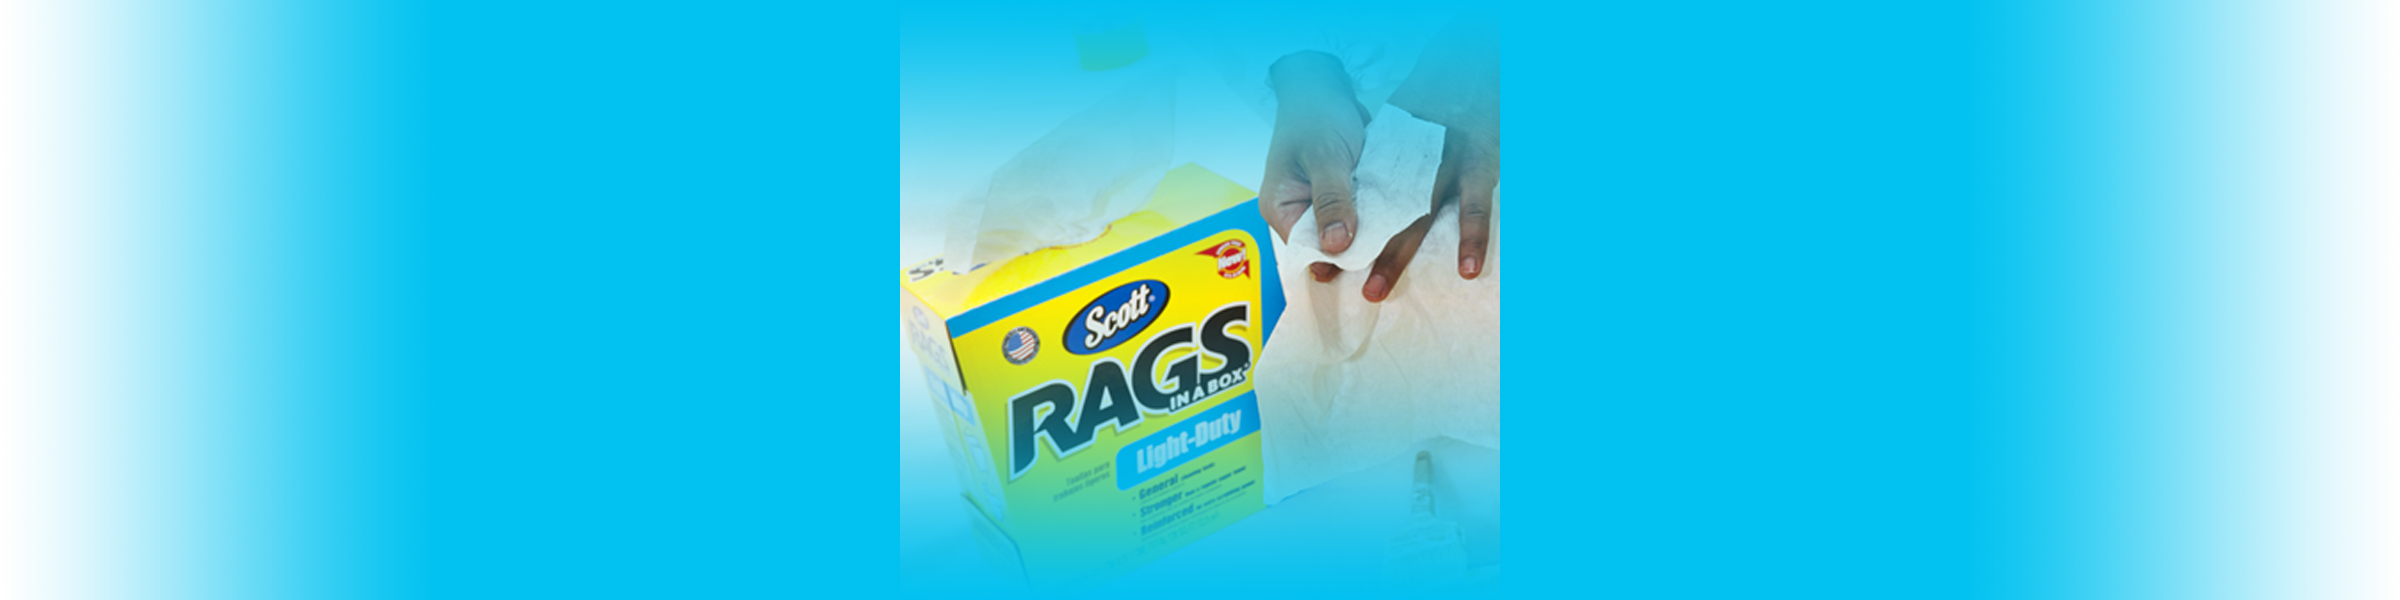 scott rags